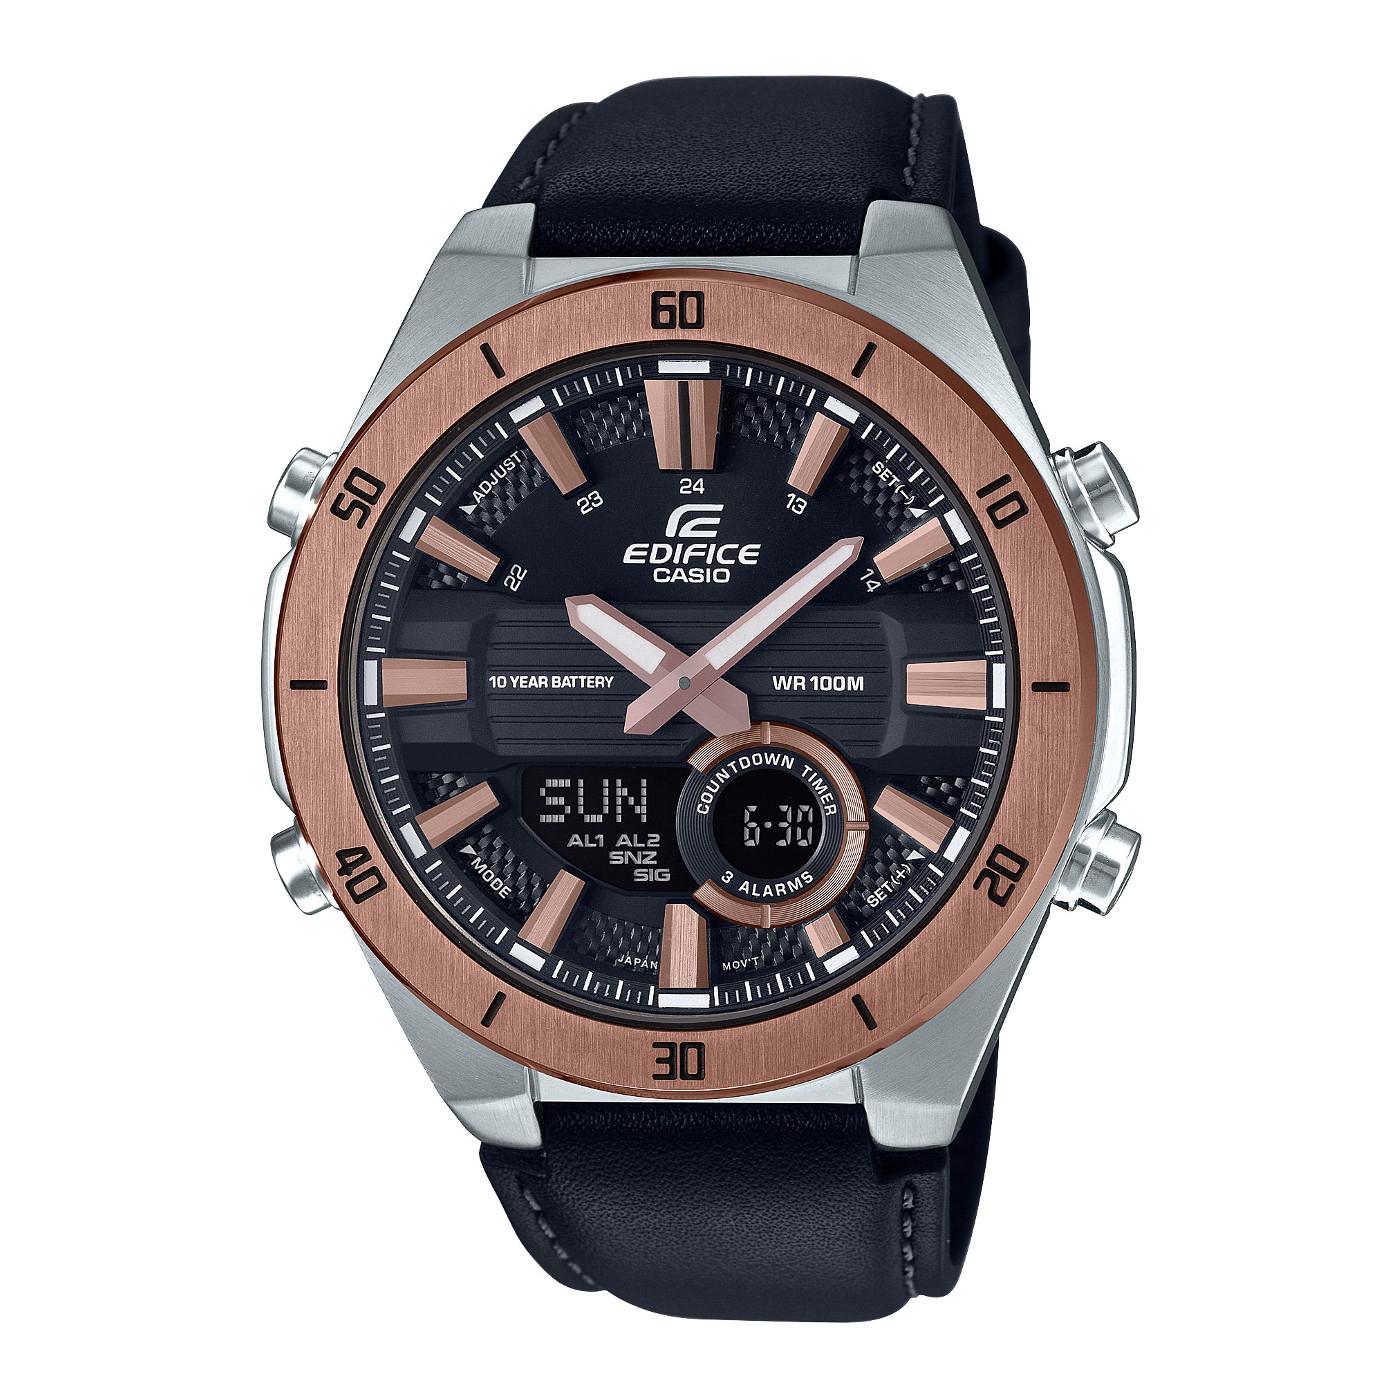 Afbeelding van Edifice Classic horloge ERA 110GL 1AVEF